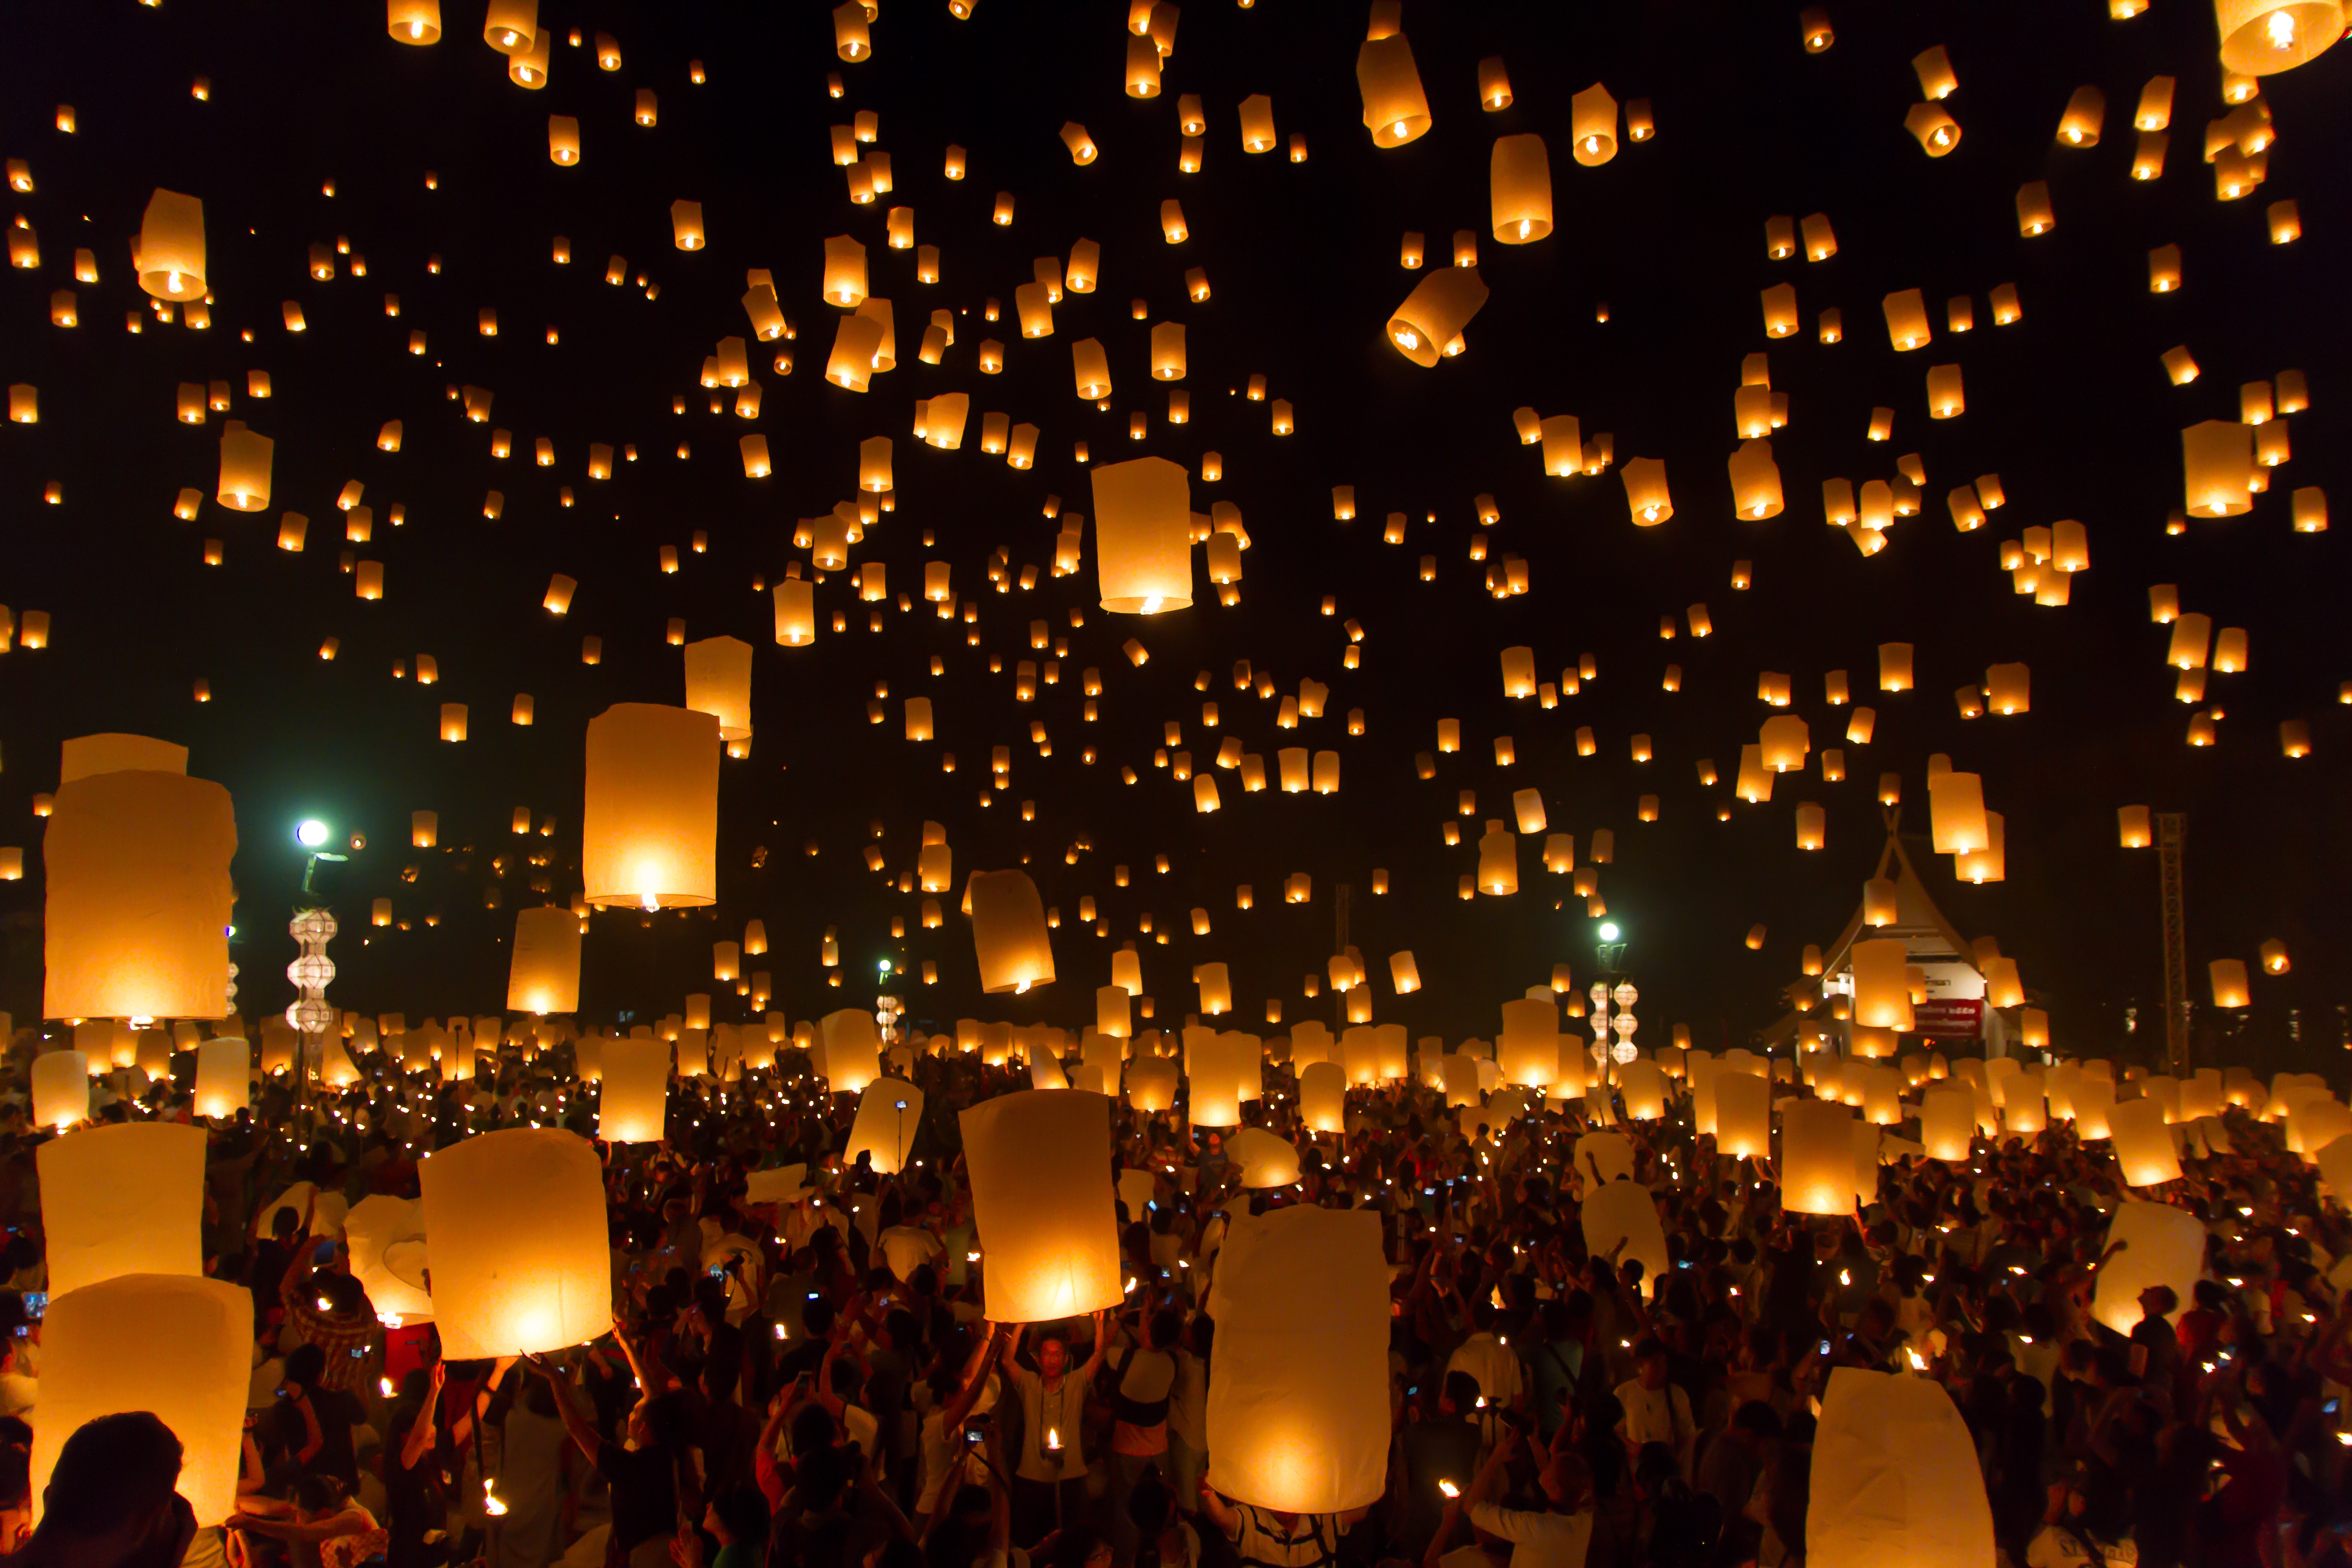 lantern festival chinese new year 2019